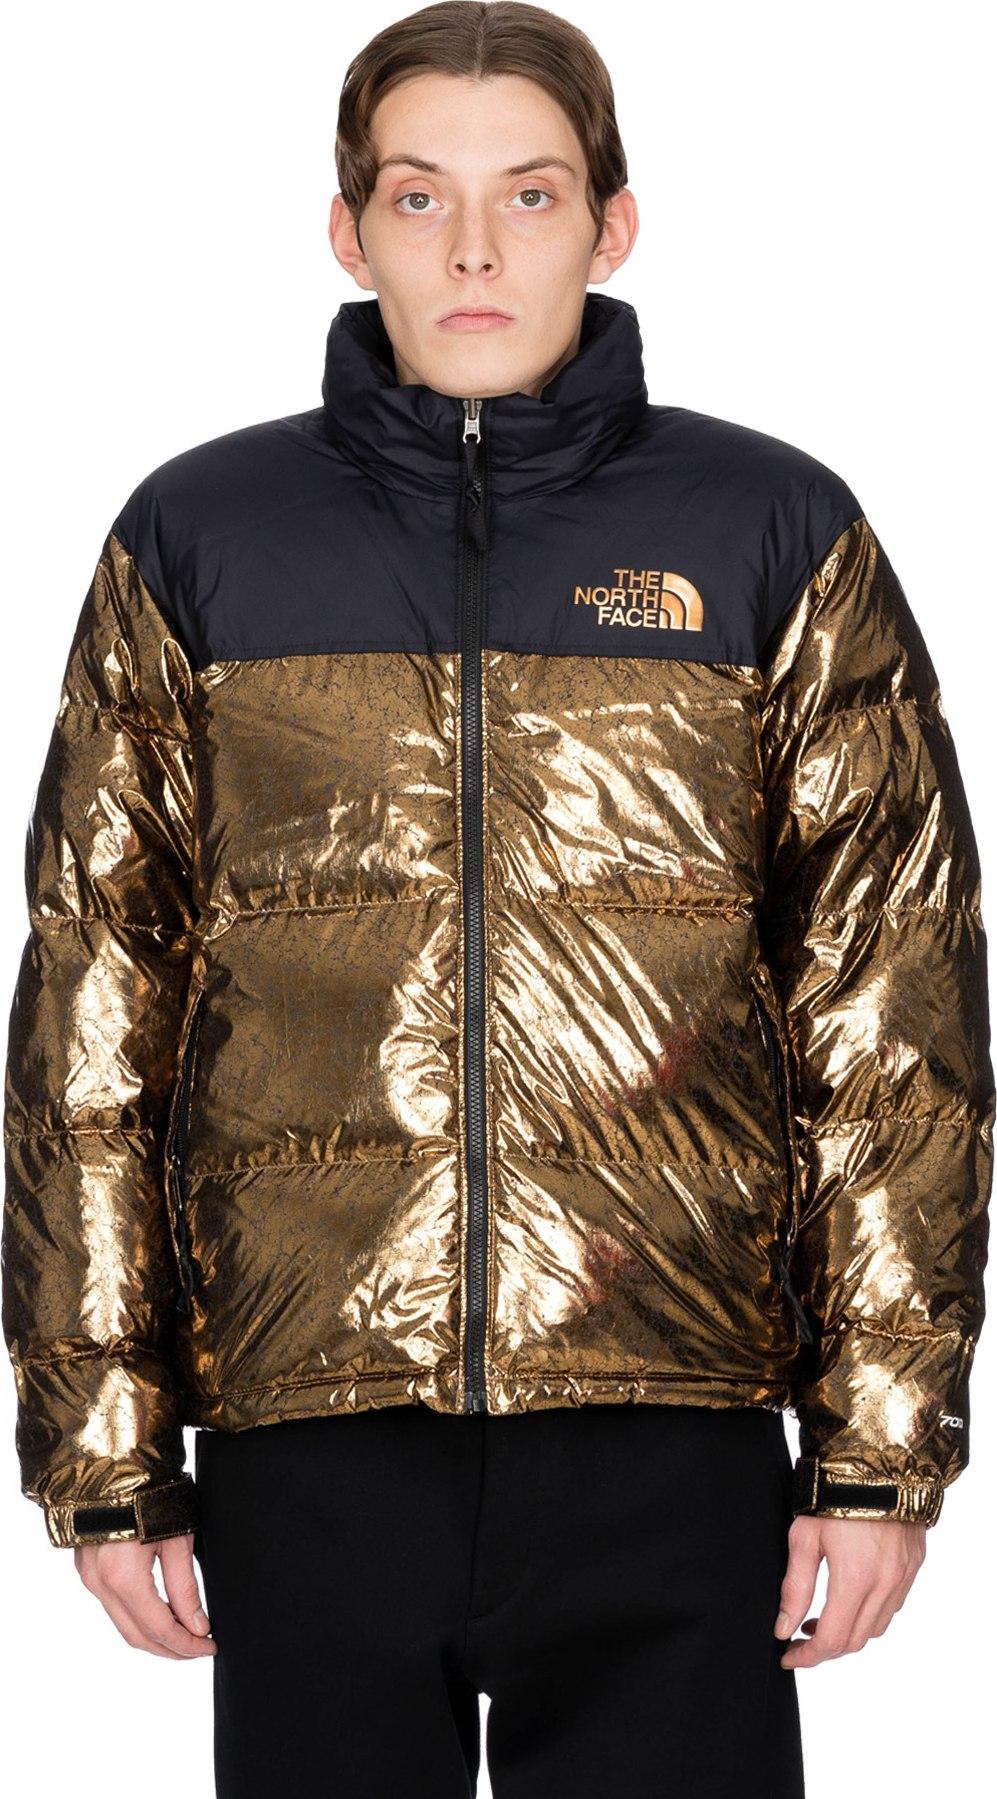 3d01ebb2f The North Face - 1996 Retro Nuptse Jacket - Metallic Copper